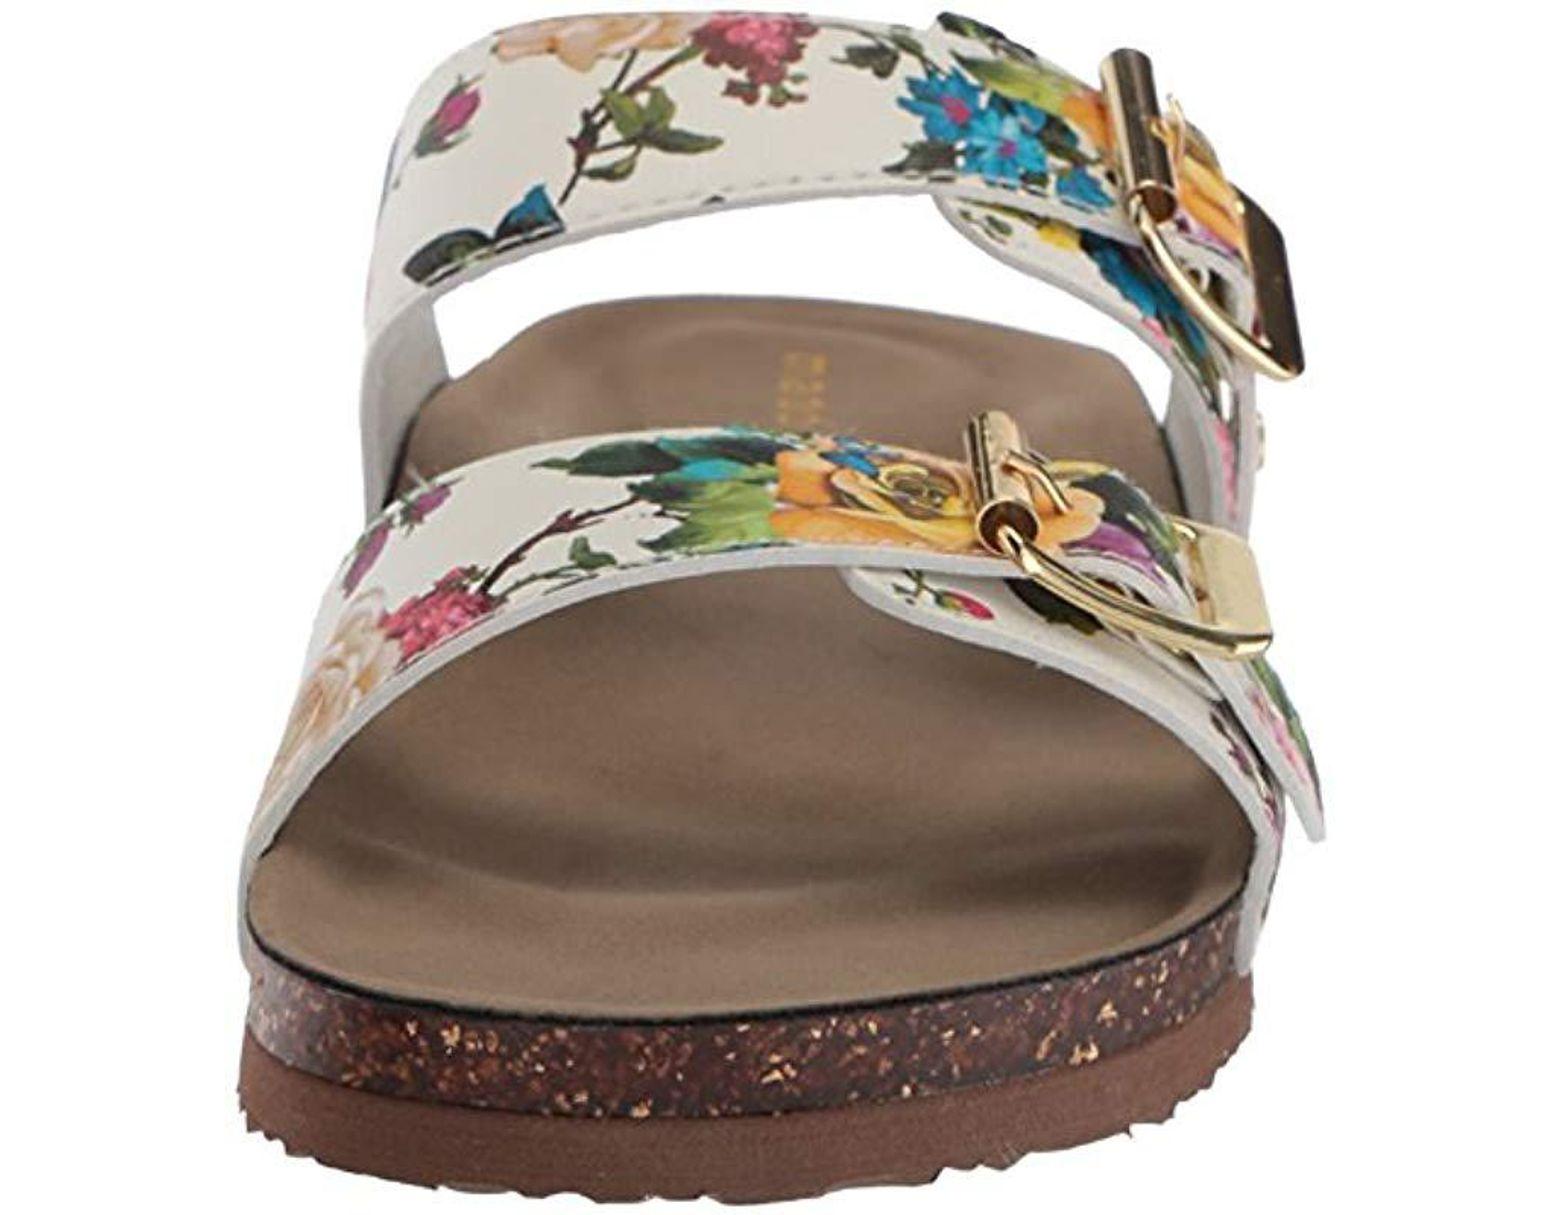 58cb3591b83b Madden Girl Brando Flat Sandal - Lyst